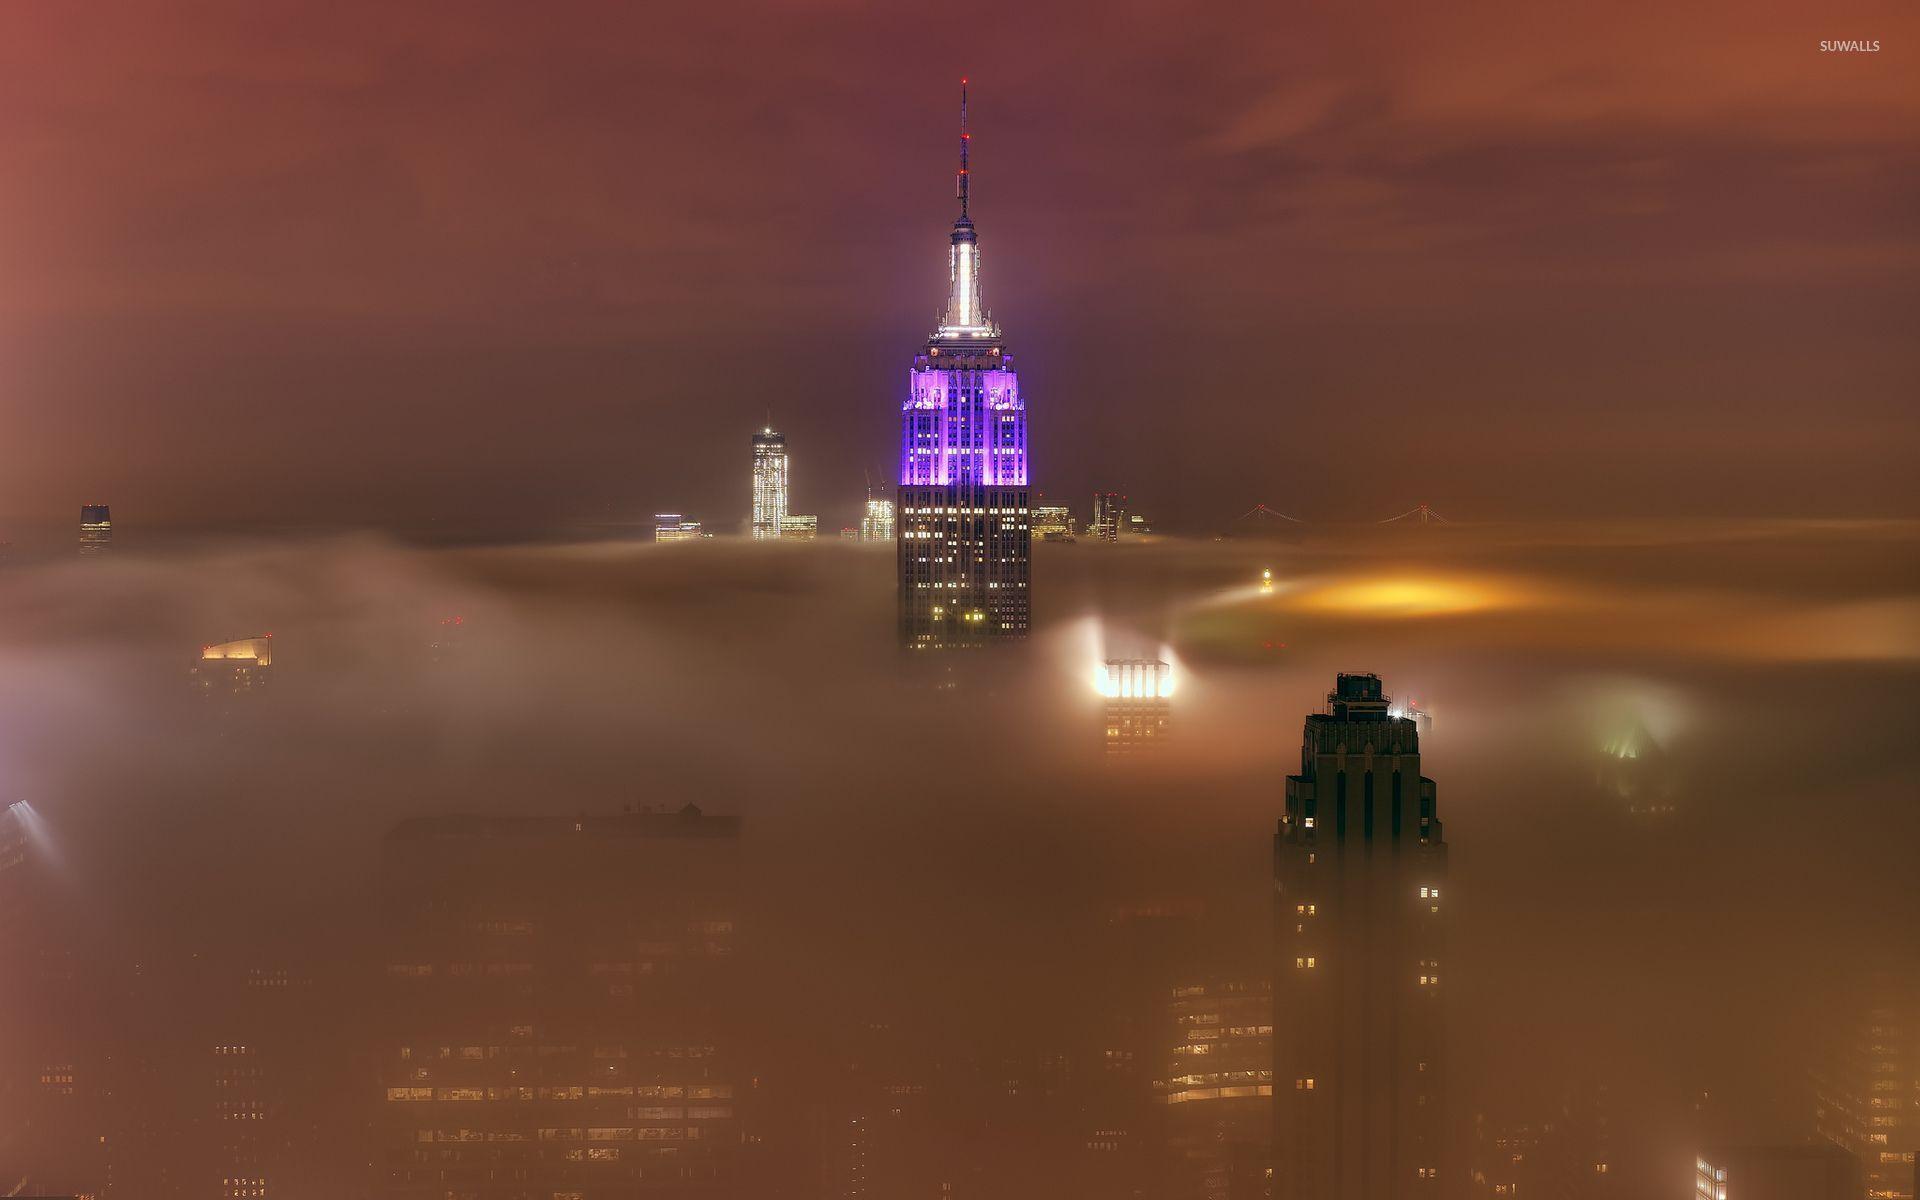 Good Wallpaper Night Empire State Building - empire-state-building-rising-above-the-fog-52503-1920x1200  Collection-30259.jpg